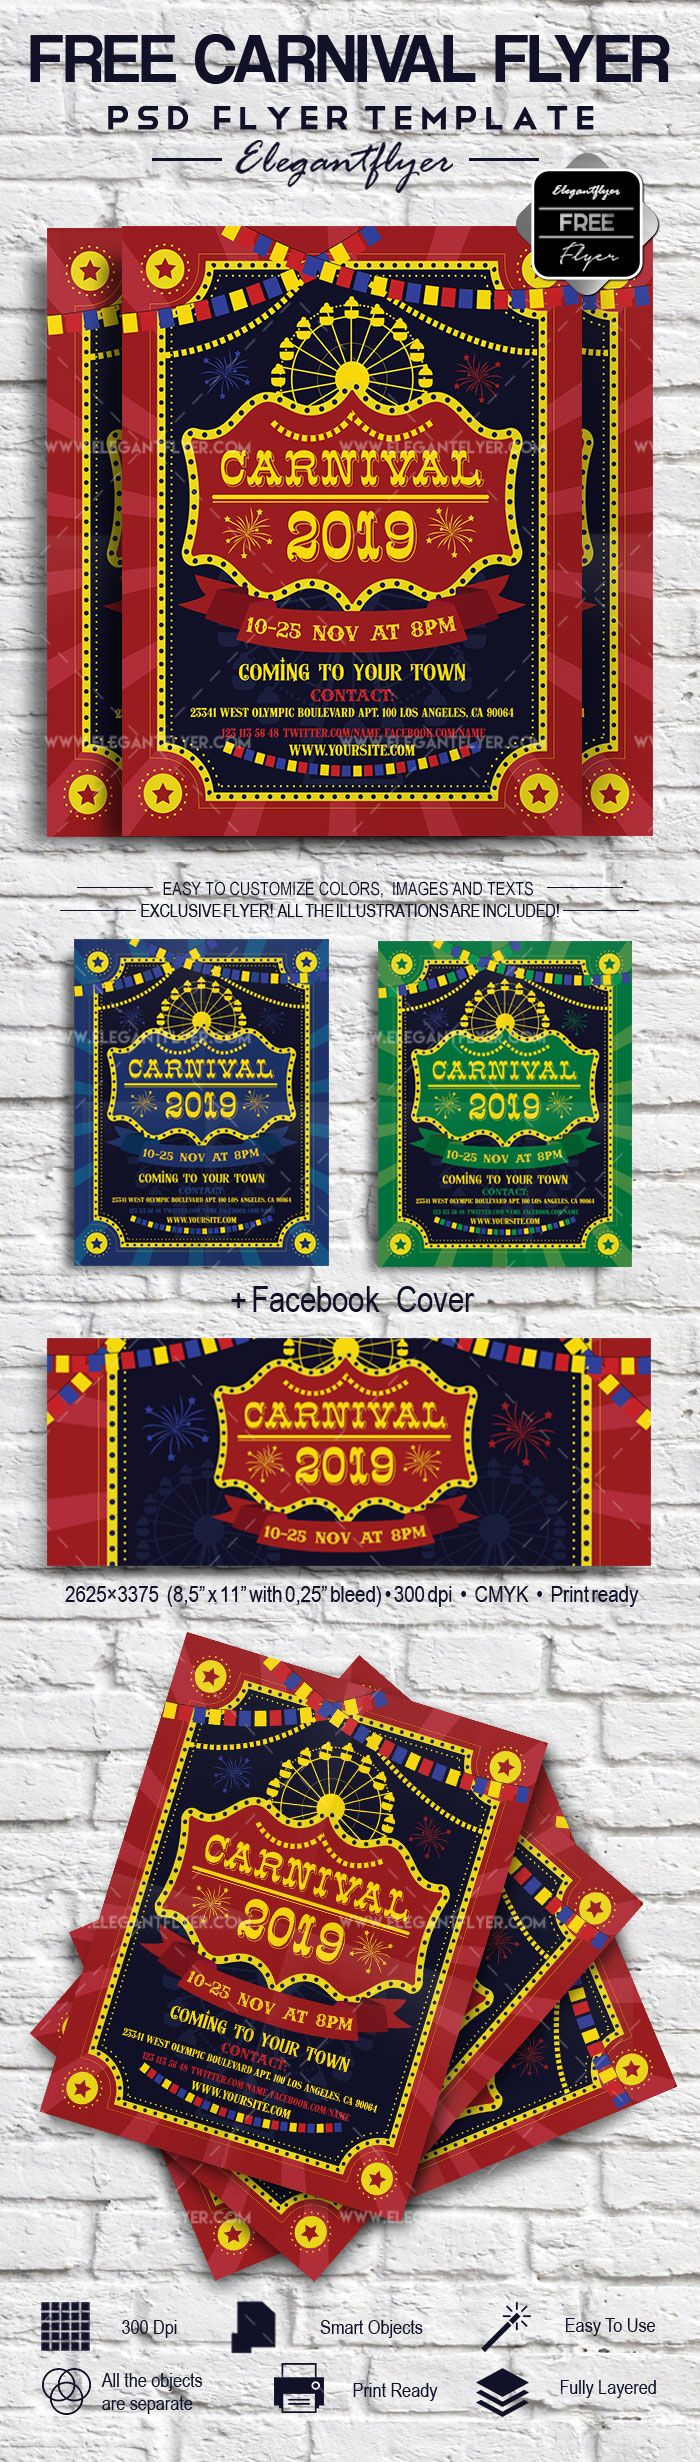 https://www.elegantflyer.com/free-flyers/carnival-free-flyer-psd-template-facebook-cover/